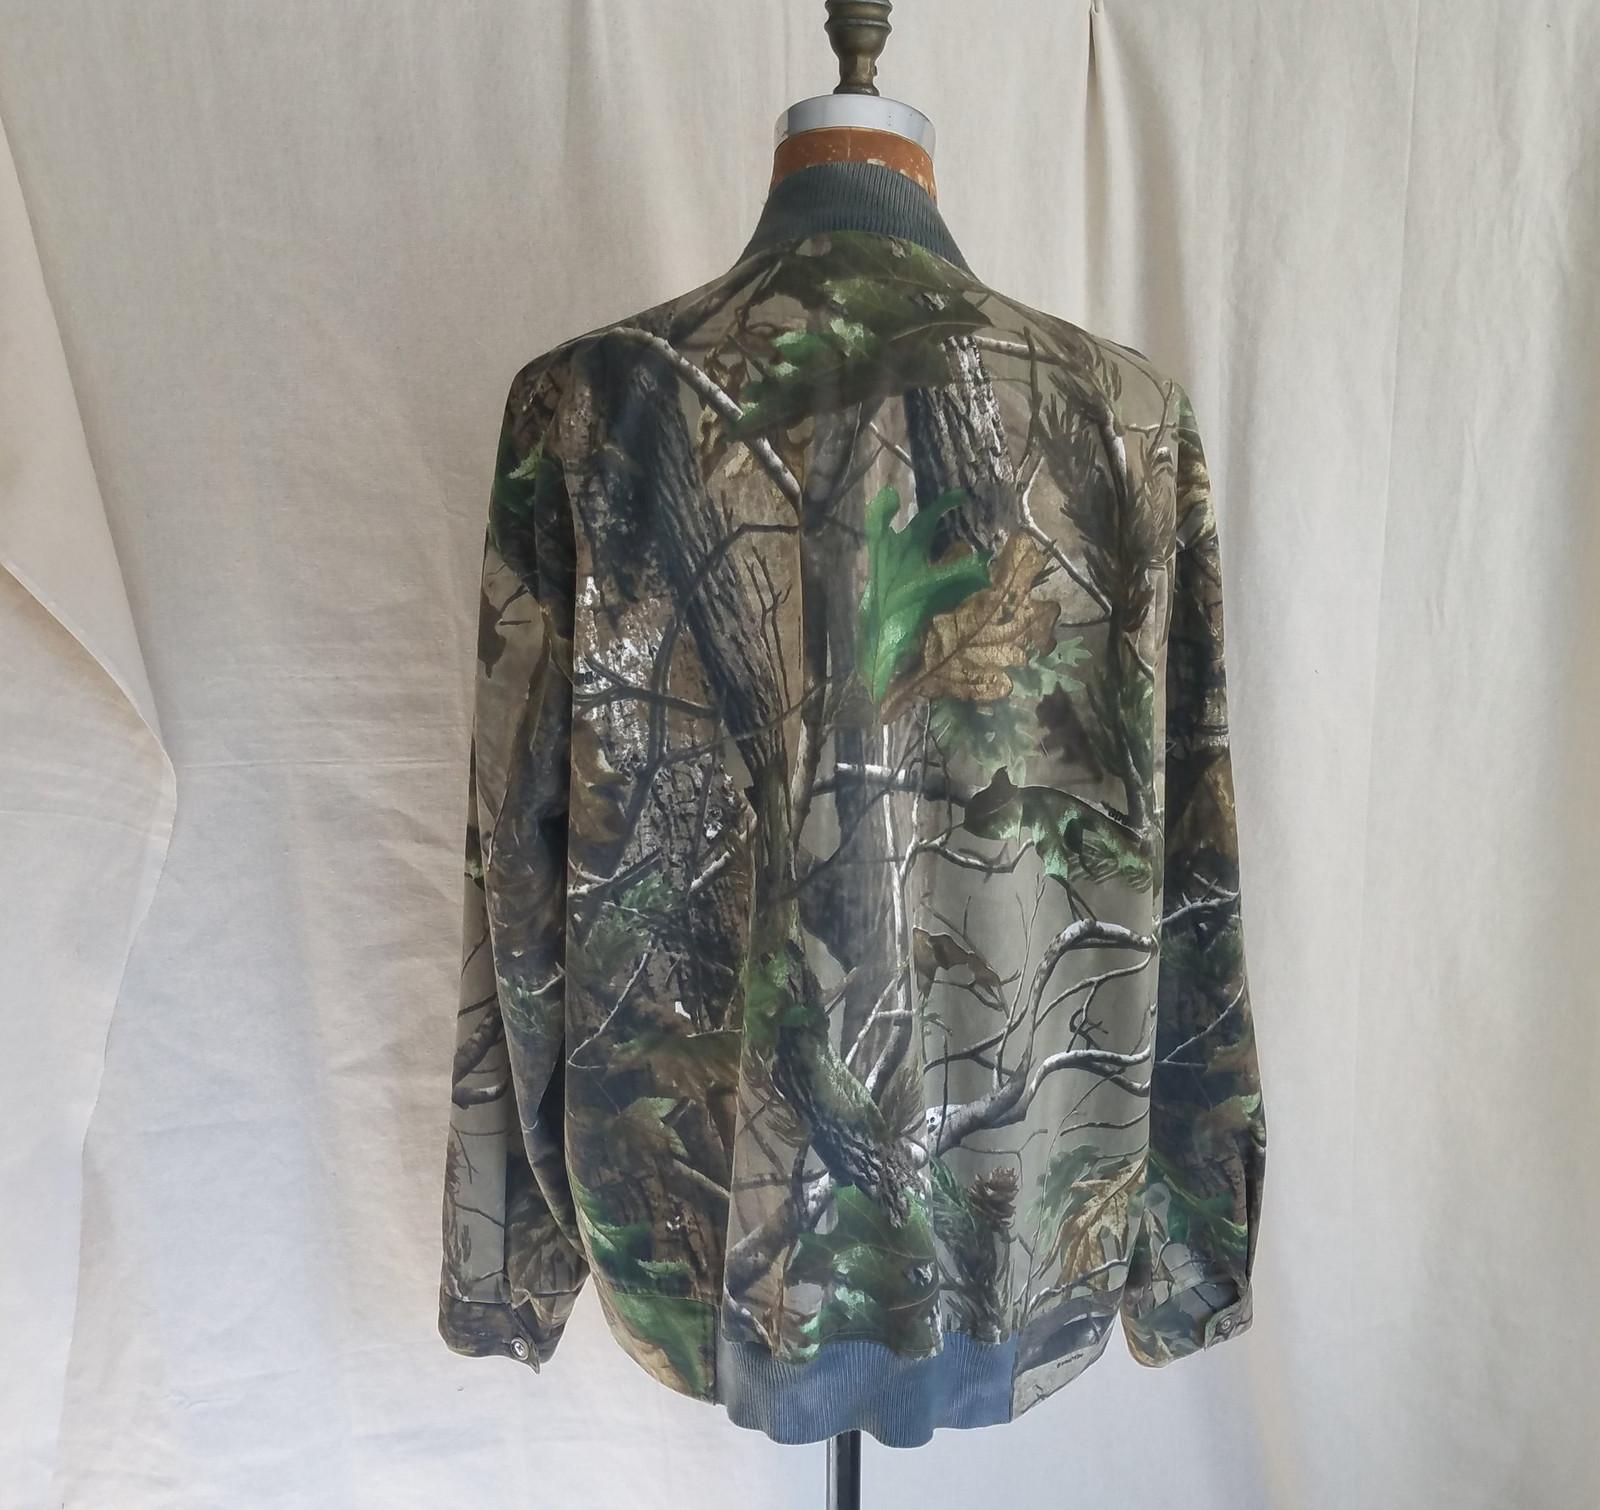 7cae0644db64b Soft Tailored Mens Fashion. Realtree Wooland Print Bomber Jacket ...